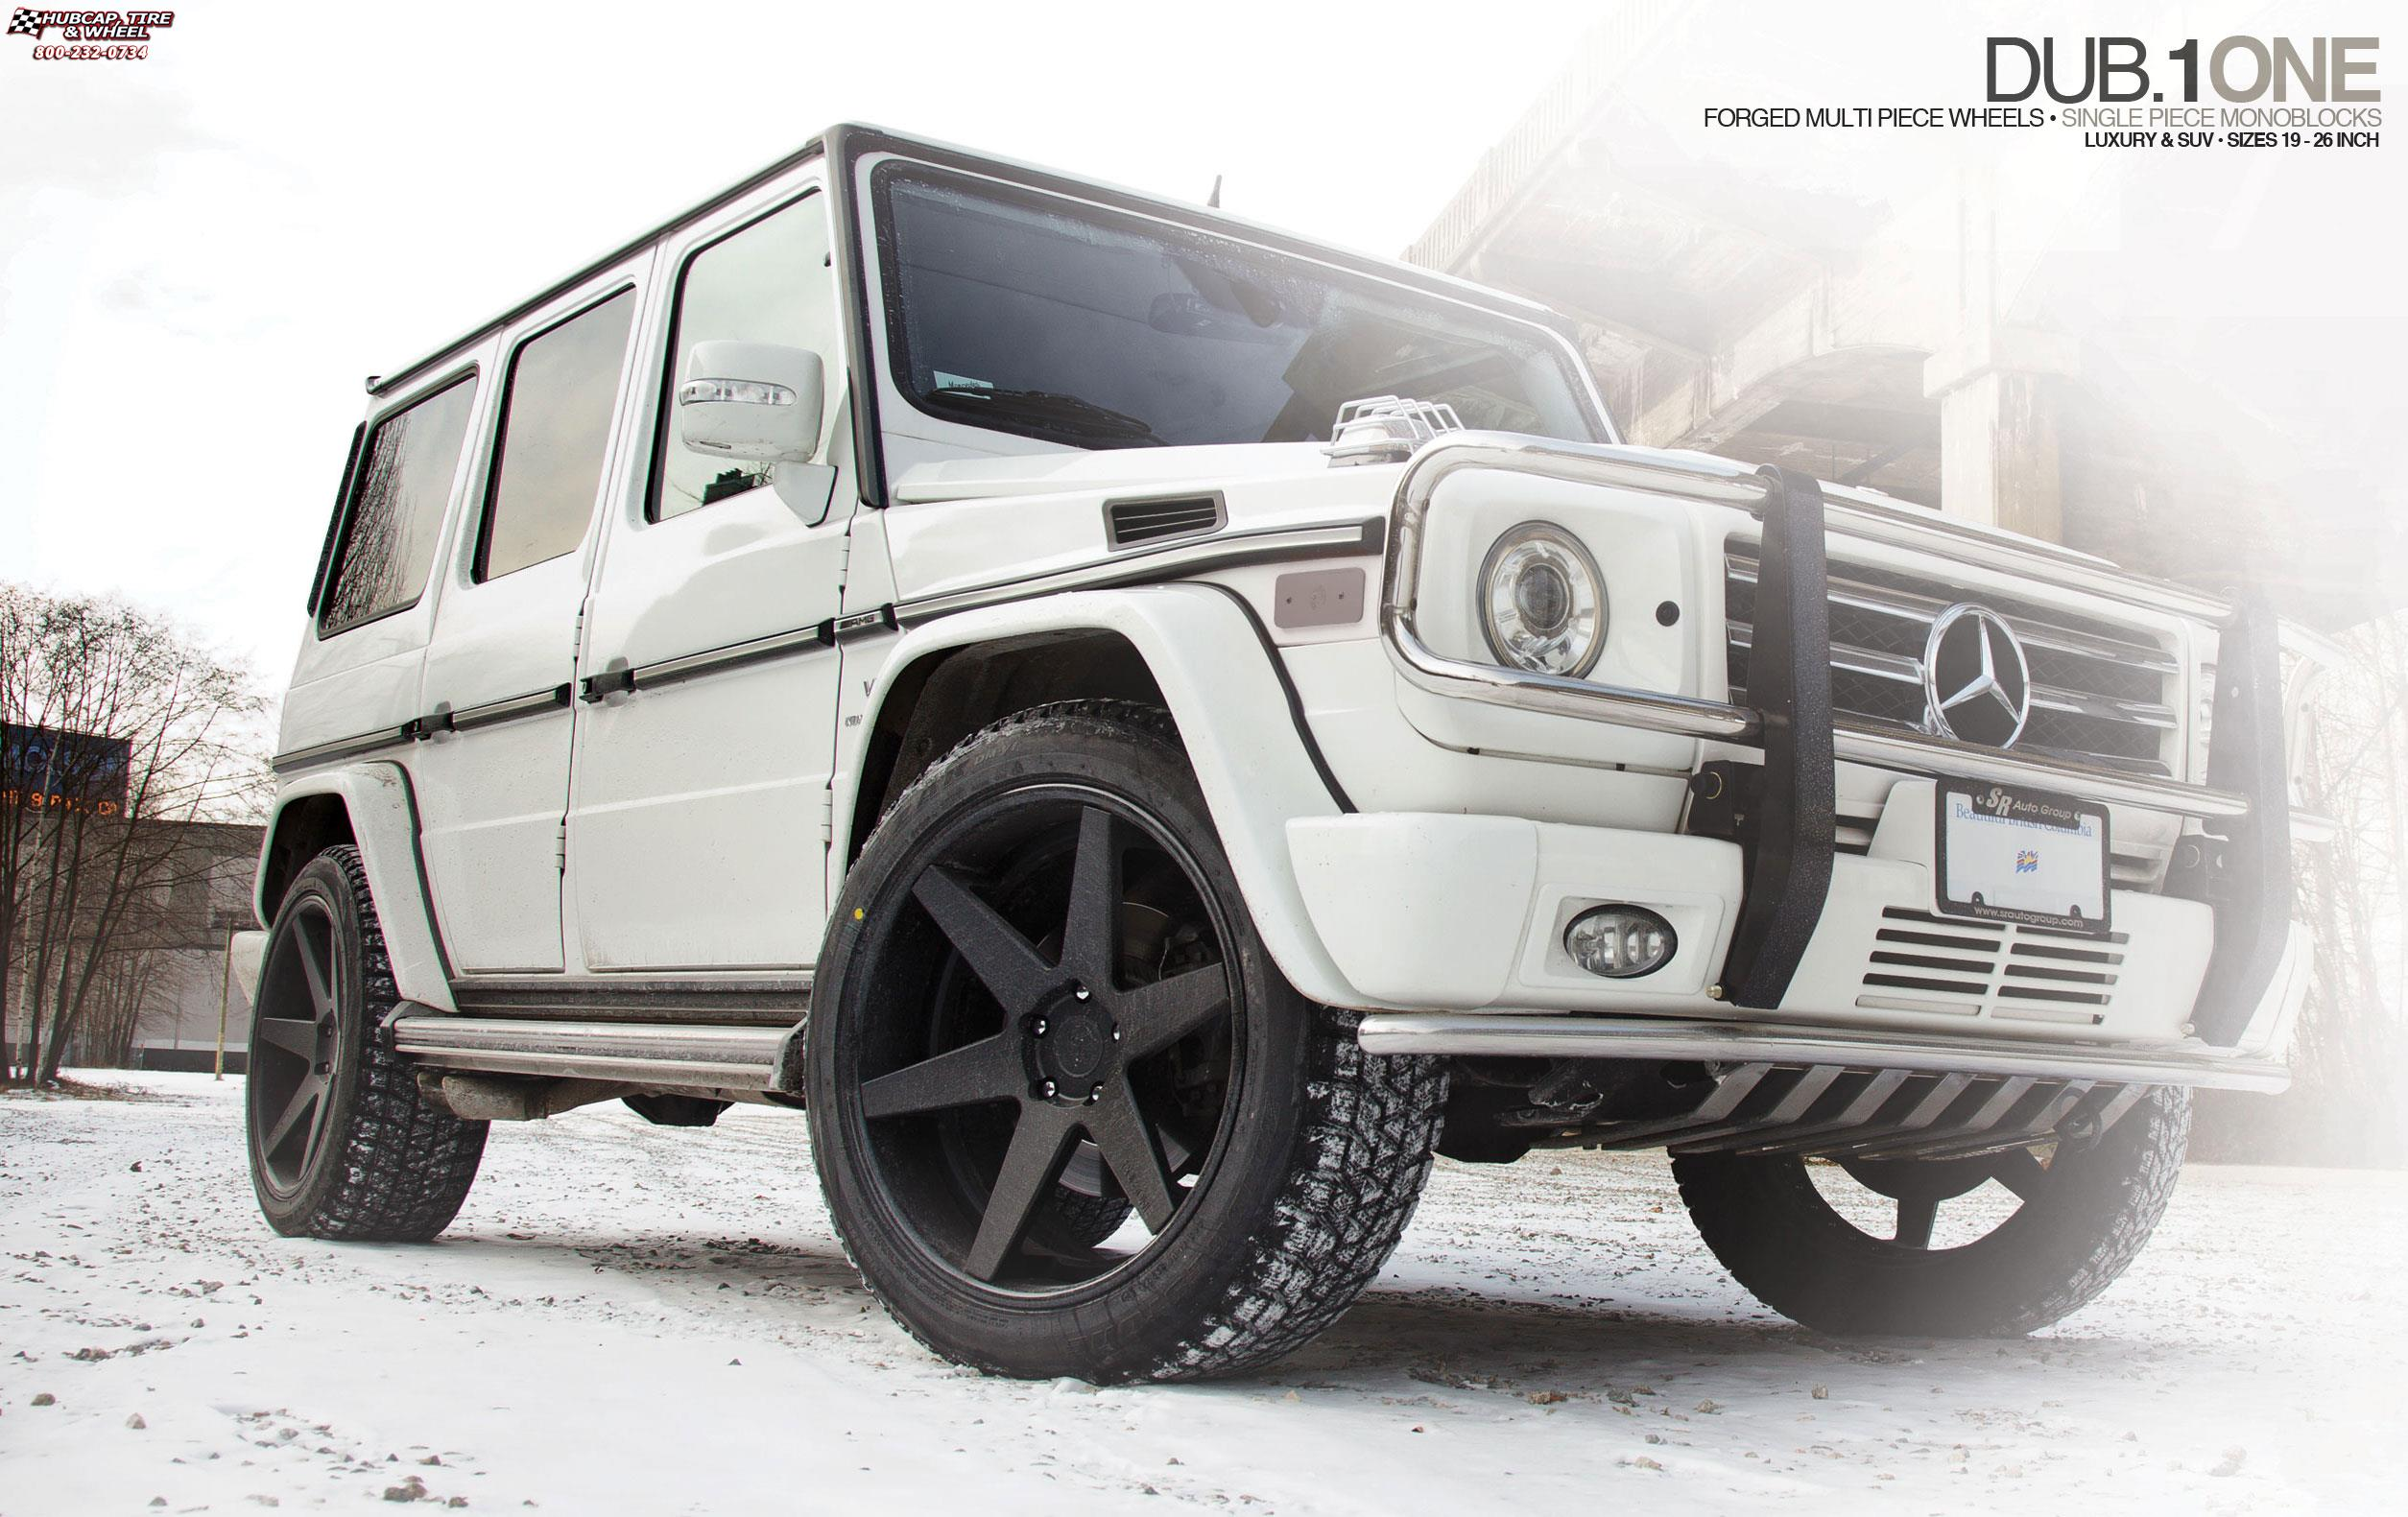 mercedes benz g wagon dub 6six wheels brushed face hi luster windows. Black Bedroom Furniture Sets. Home Design Ideas